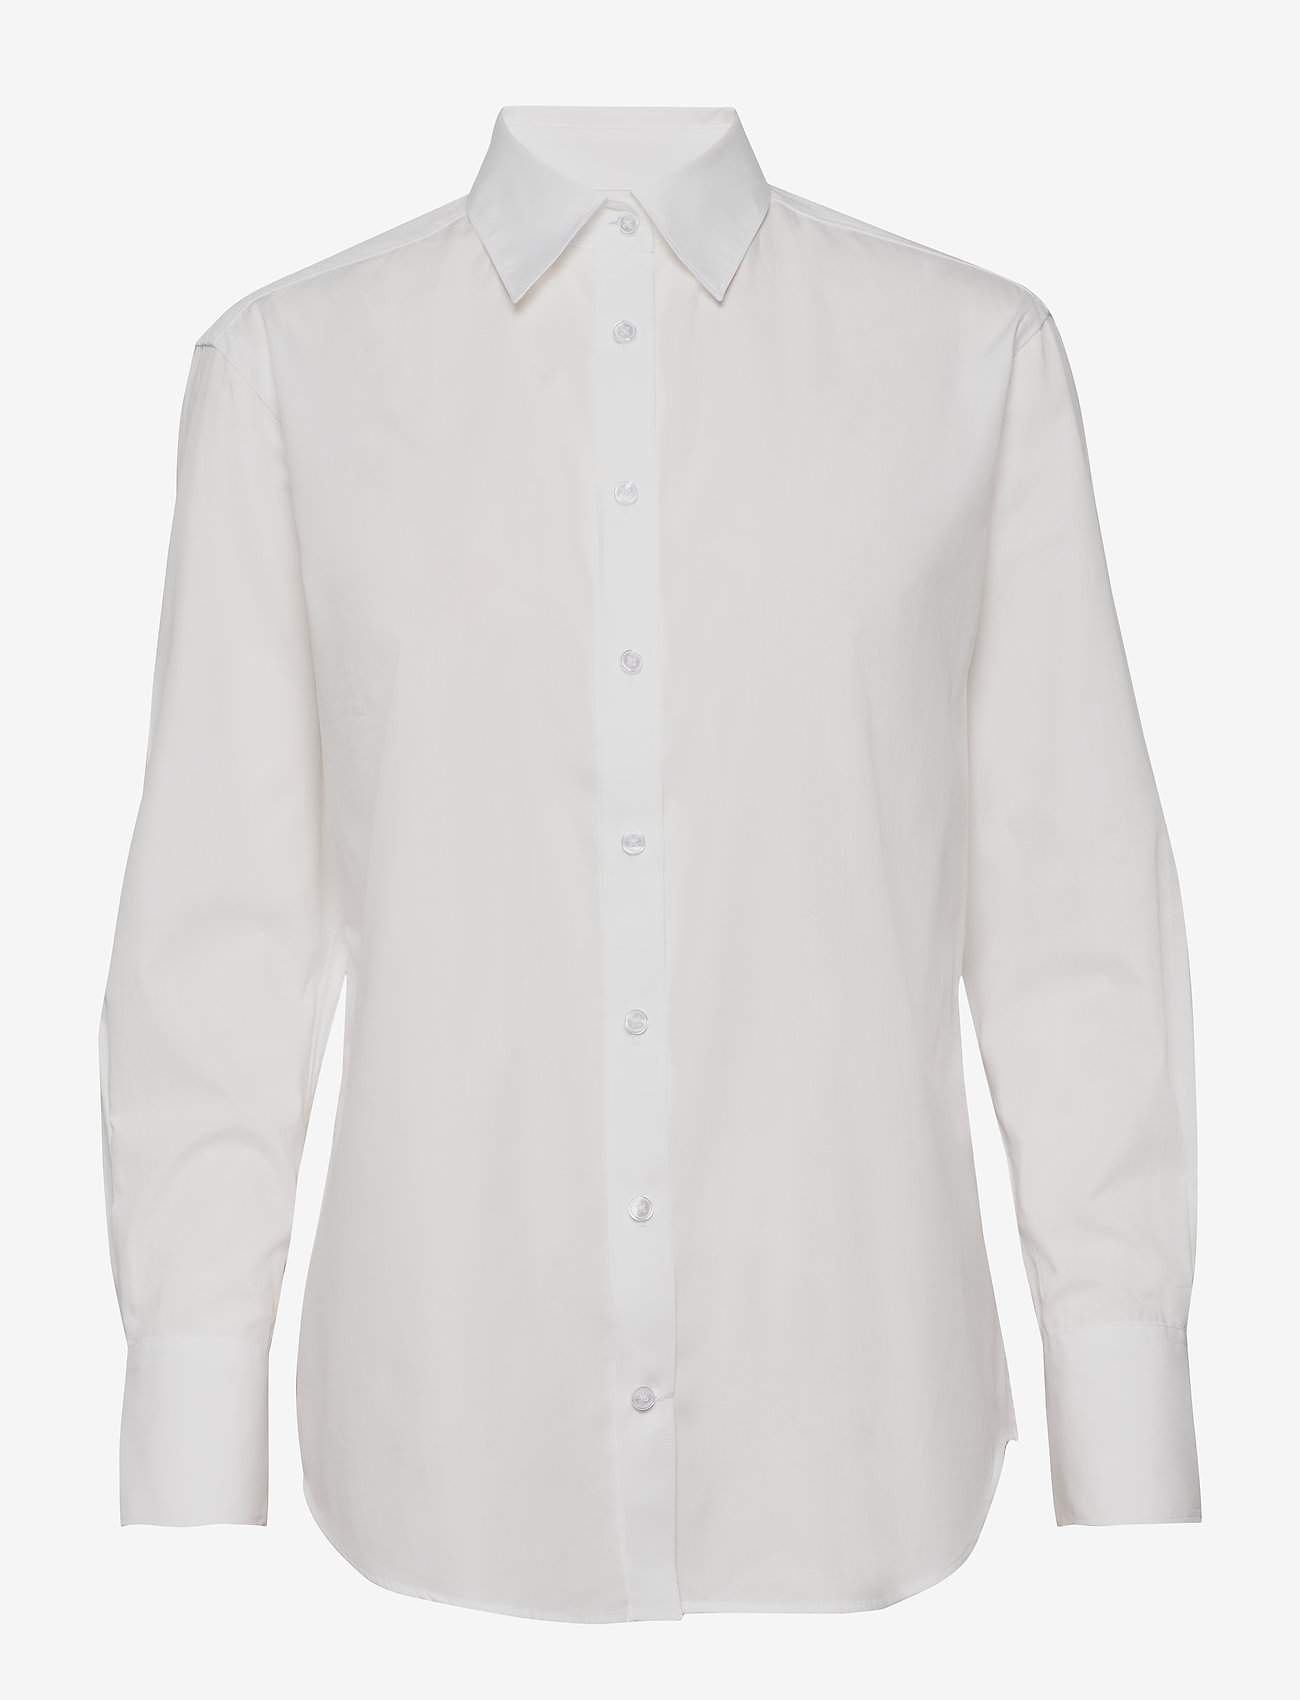 SAND - 8704 - Nube - chemises à manches longues - optical white - 0